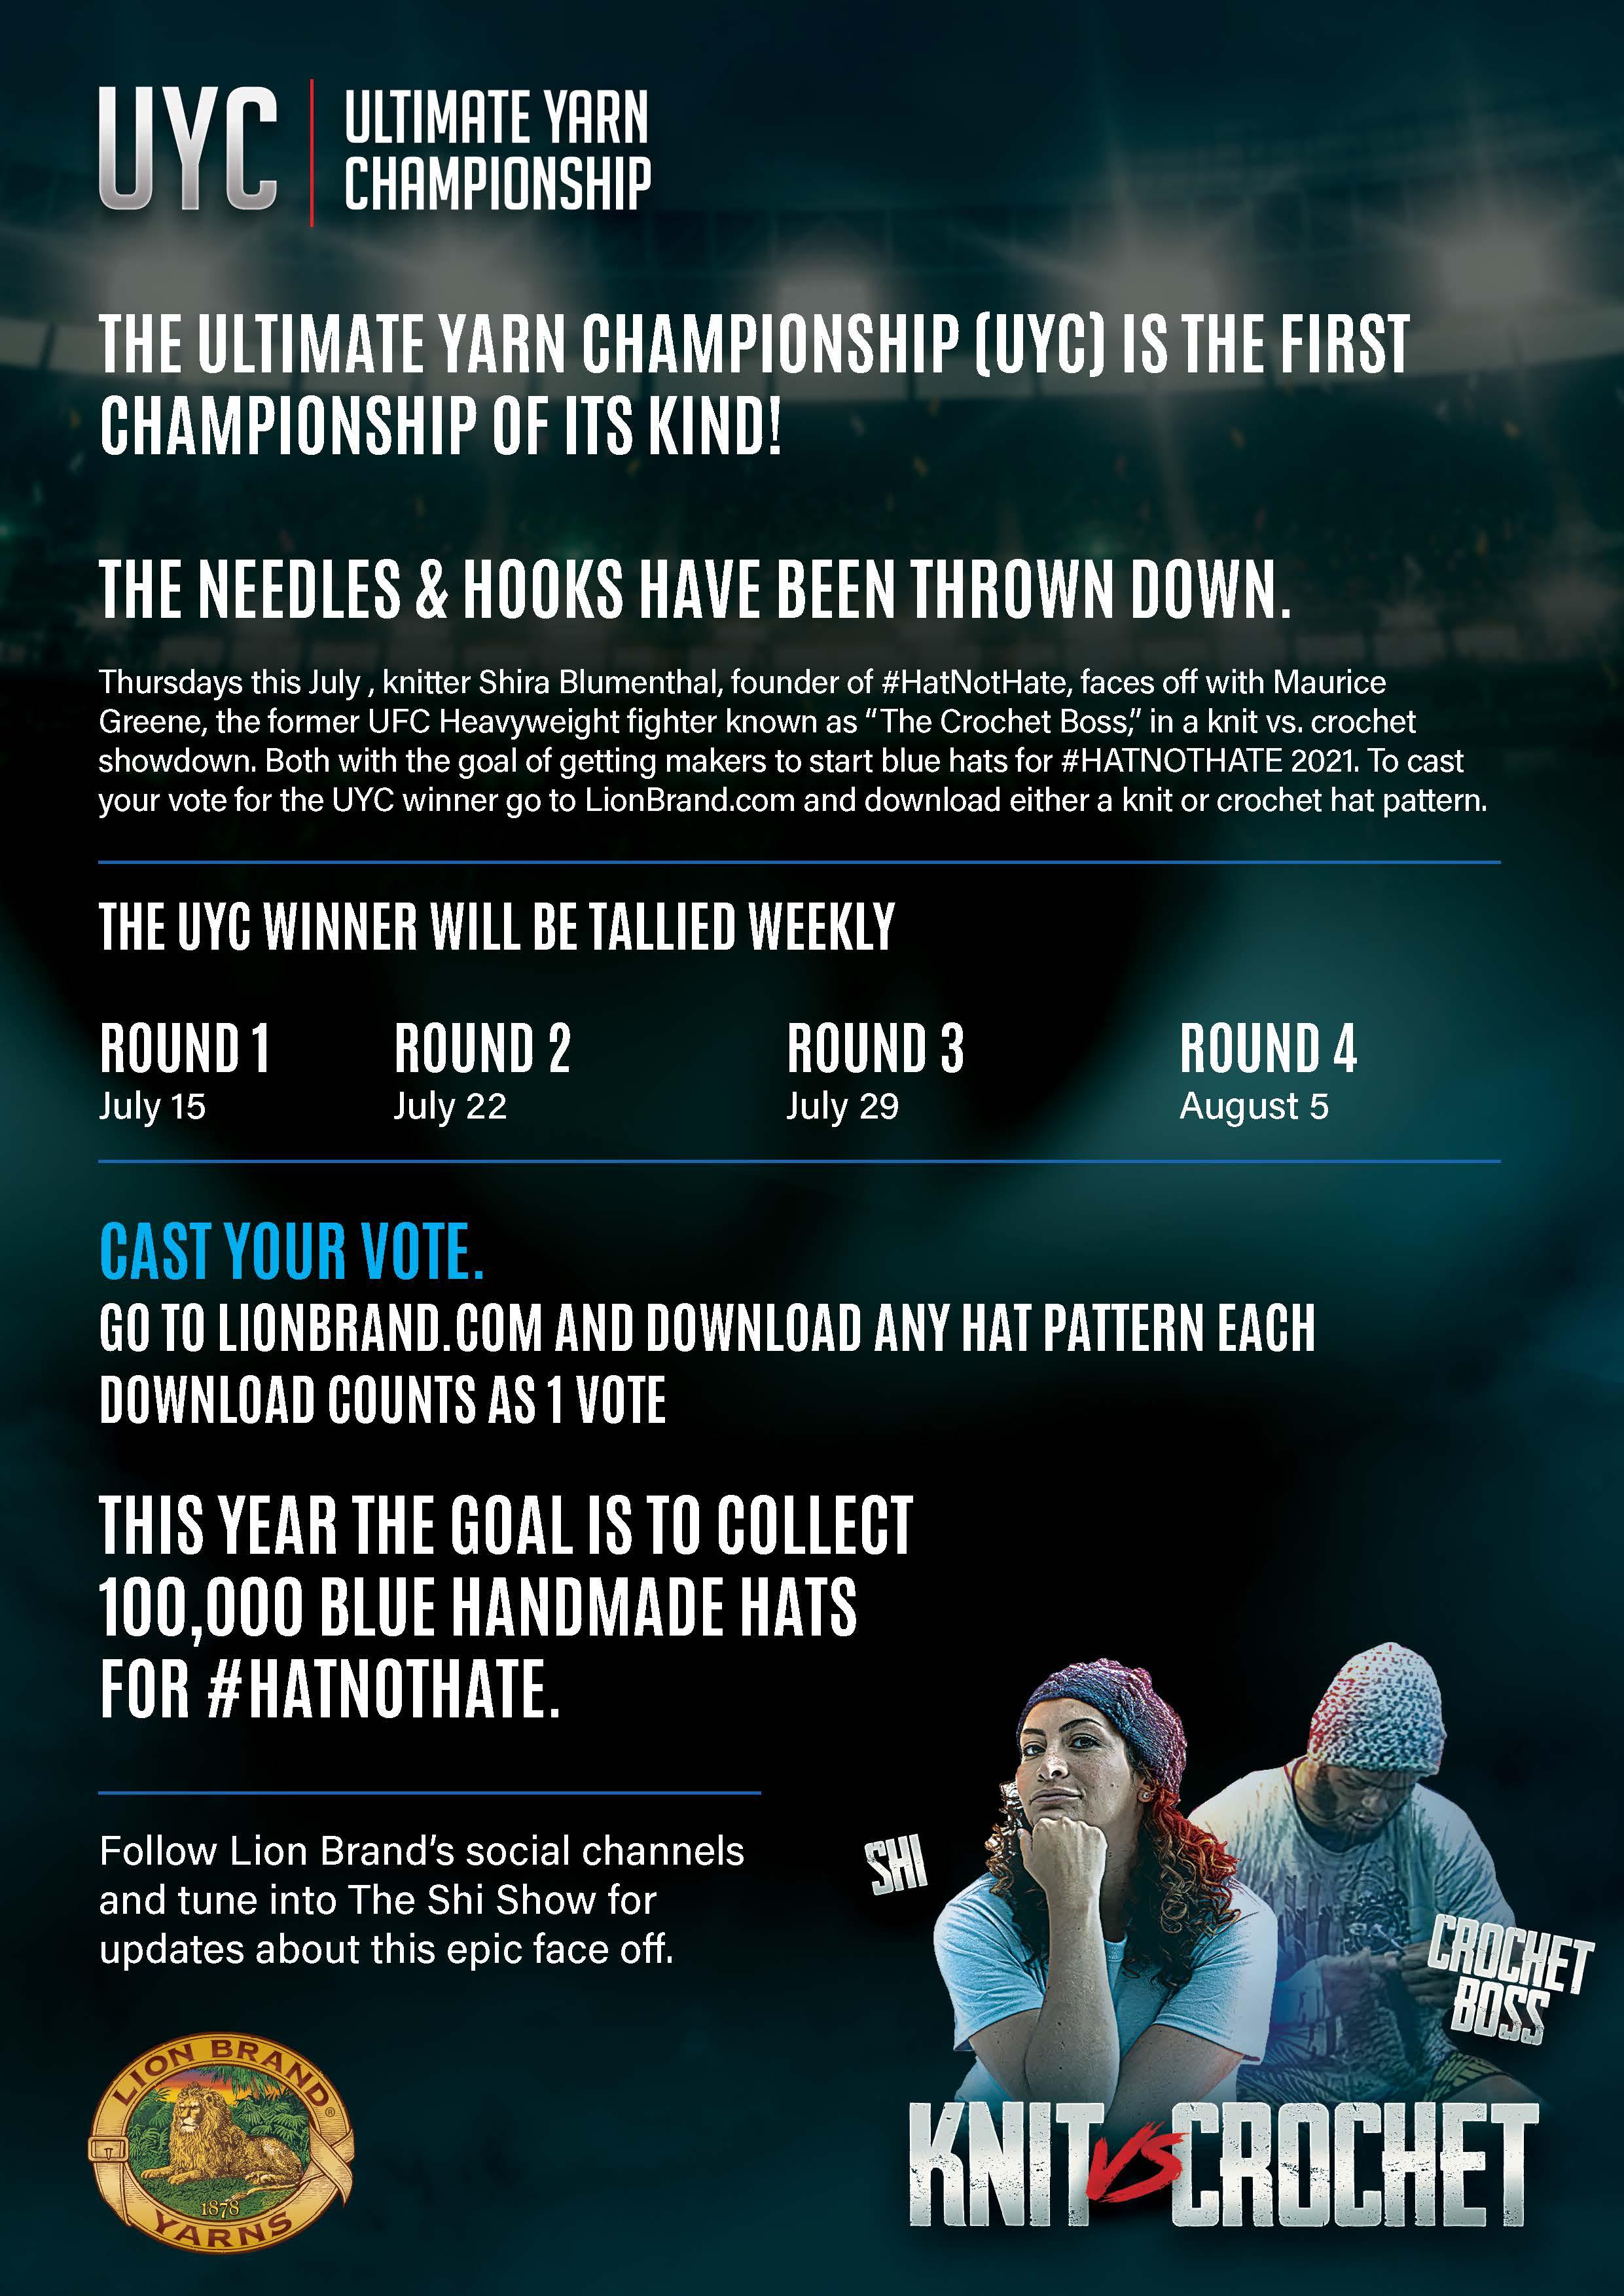 Ultimate Yarn Championship